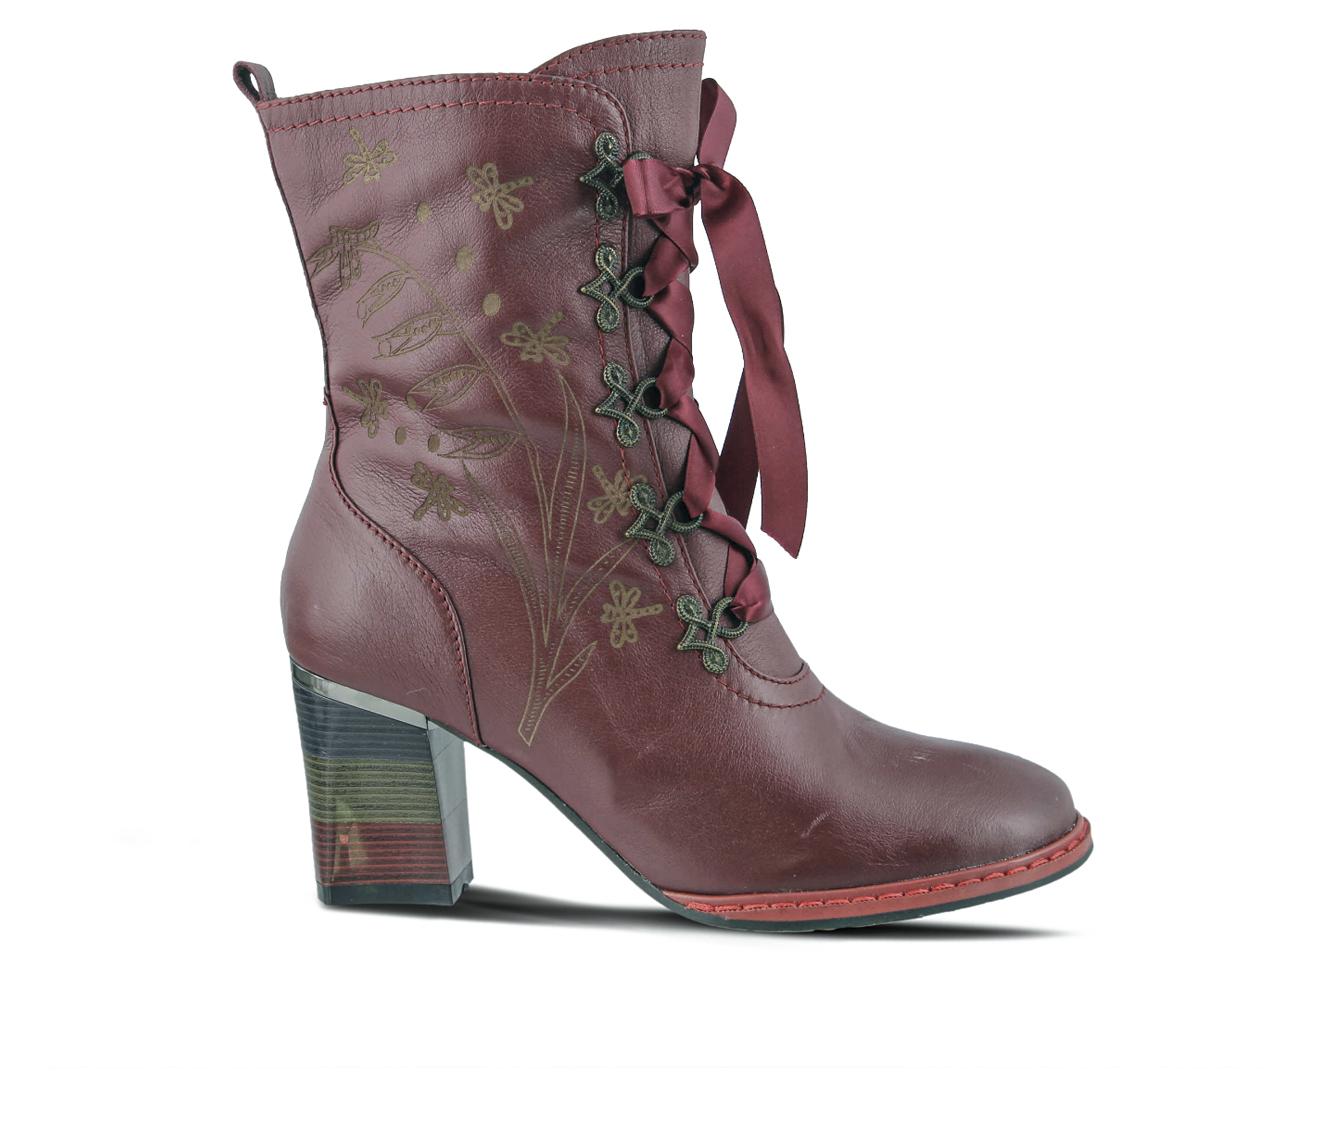 L'Artiste Juliette Women's Boots (Black Leather)